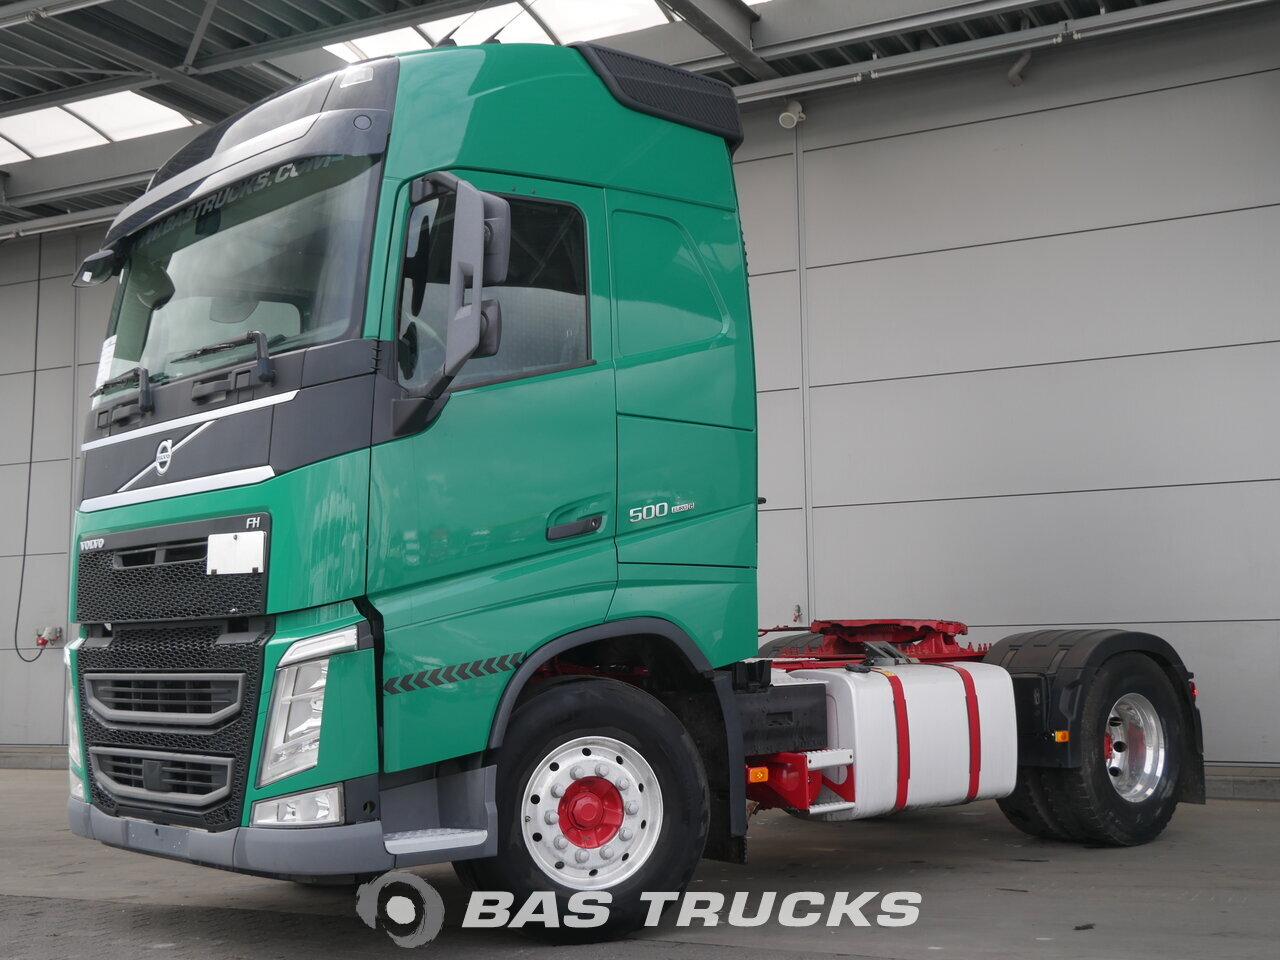 volvo fh 500 tracteur euro 6 37800 bas trucks. Black Bedroom Furniture Sets. Home Design Ideas